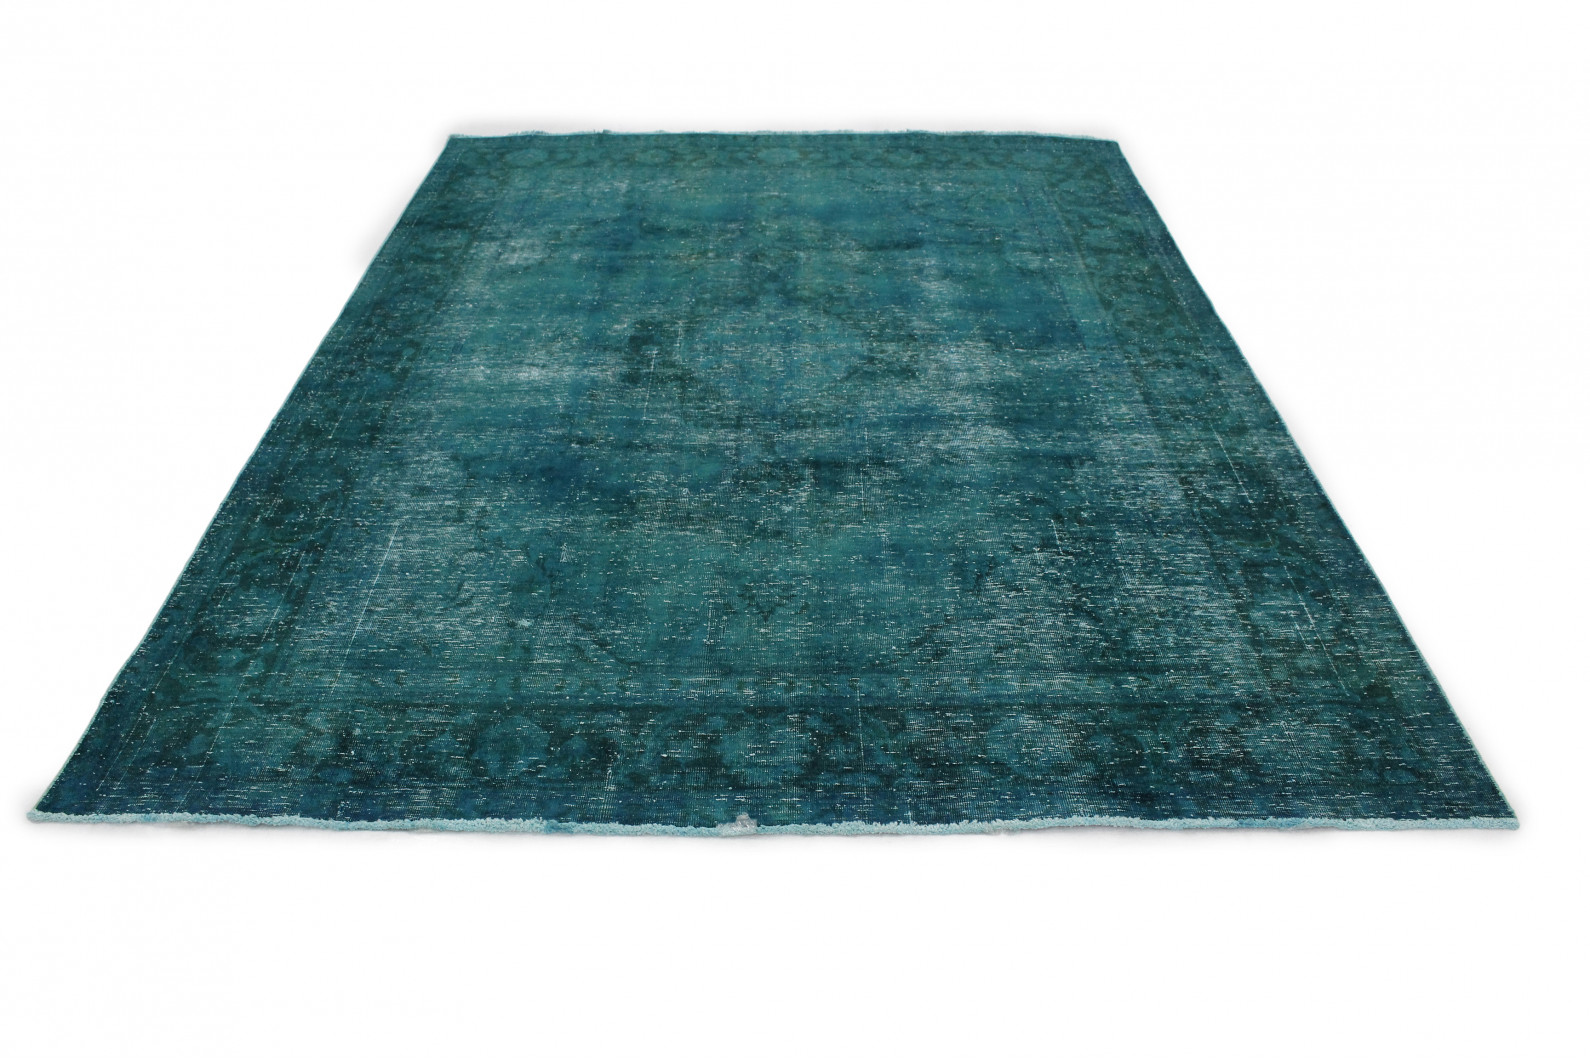 vintage teppich t rkis in 340x240 1001 177261 bei kaufen. Black Bedroom Furniture Sets. Home Design Ideas